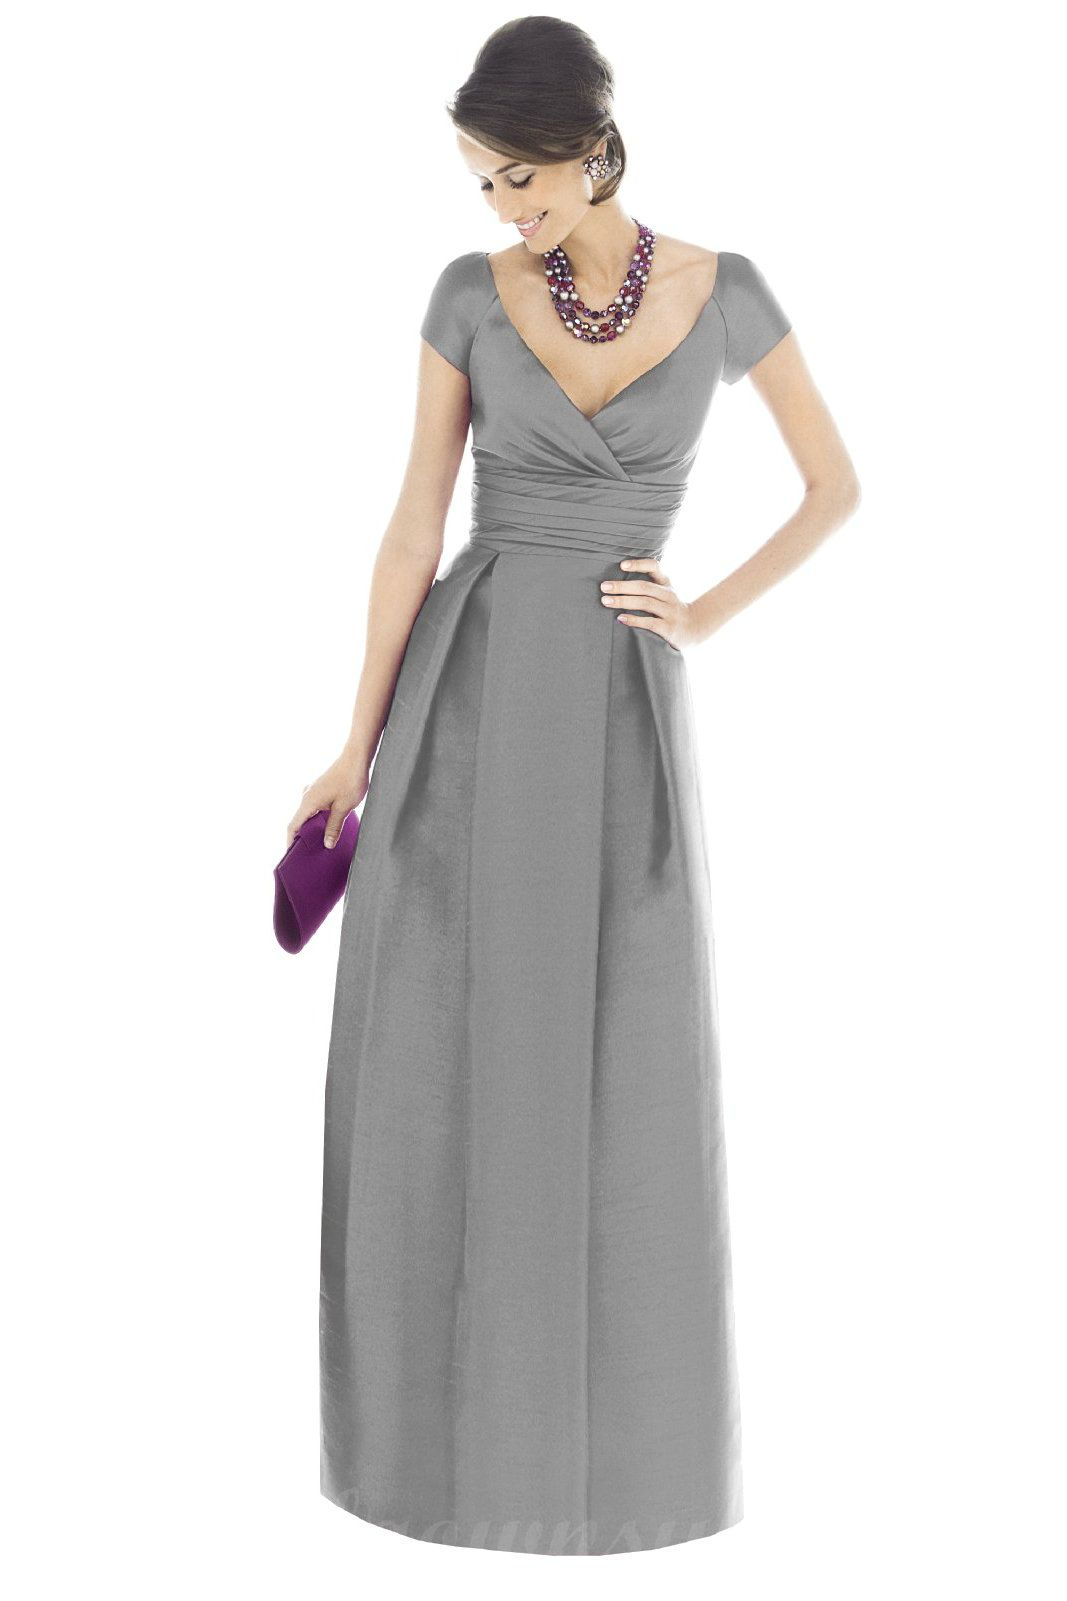 Bridesmaid dresses buy cheap v neck satin puffy grey bridesmaid bridesmaid dresses buy cheap v neck satin puffy grey bridesmaid dresses ombrellifo Choice Image